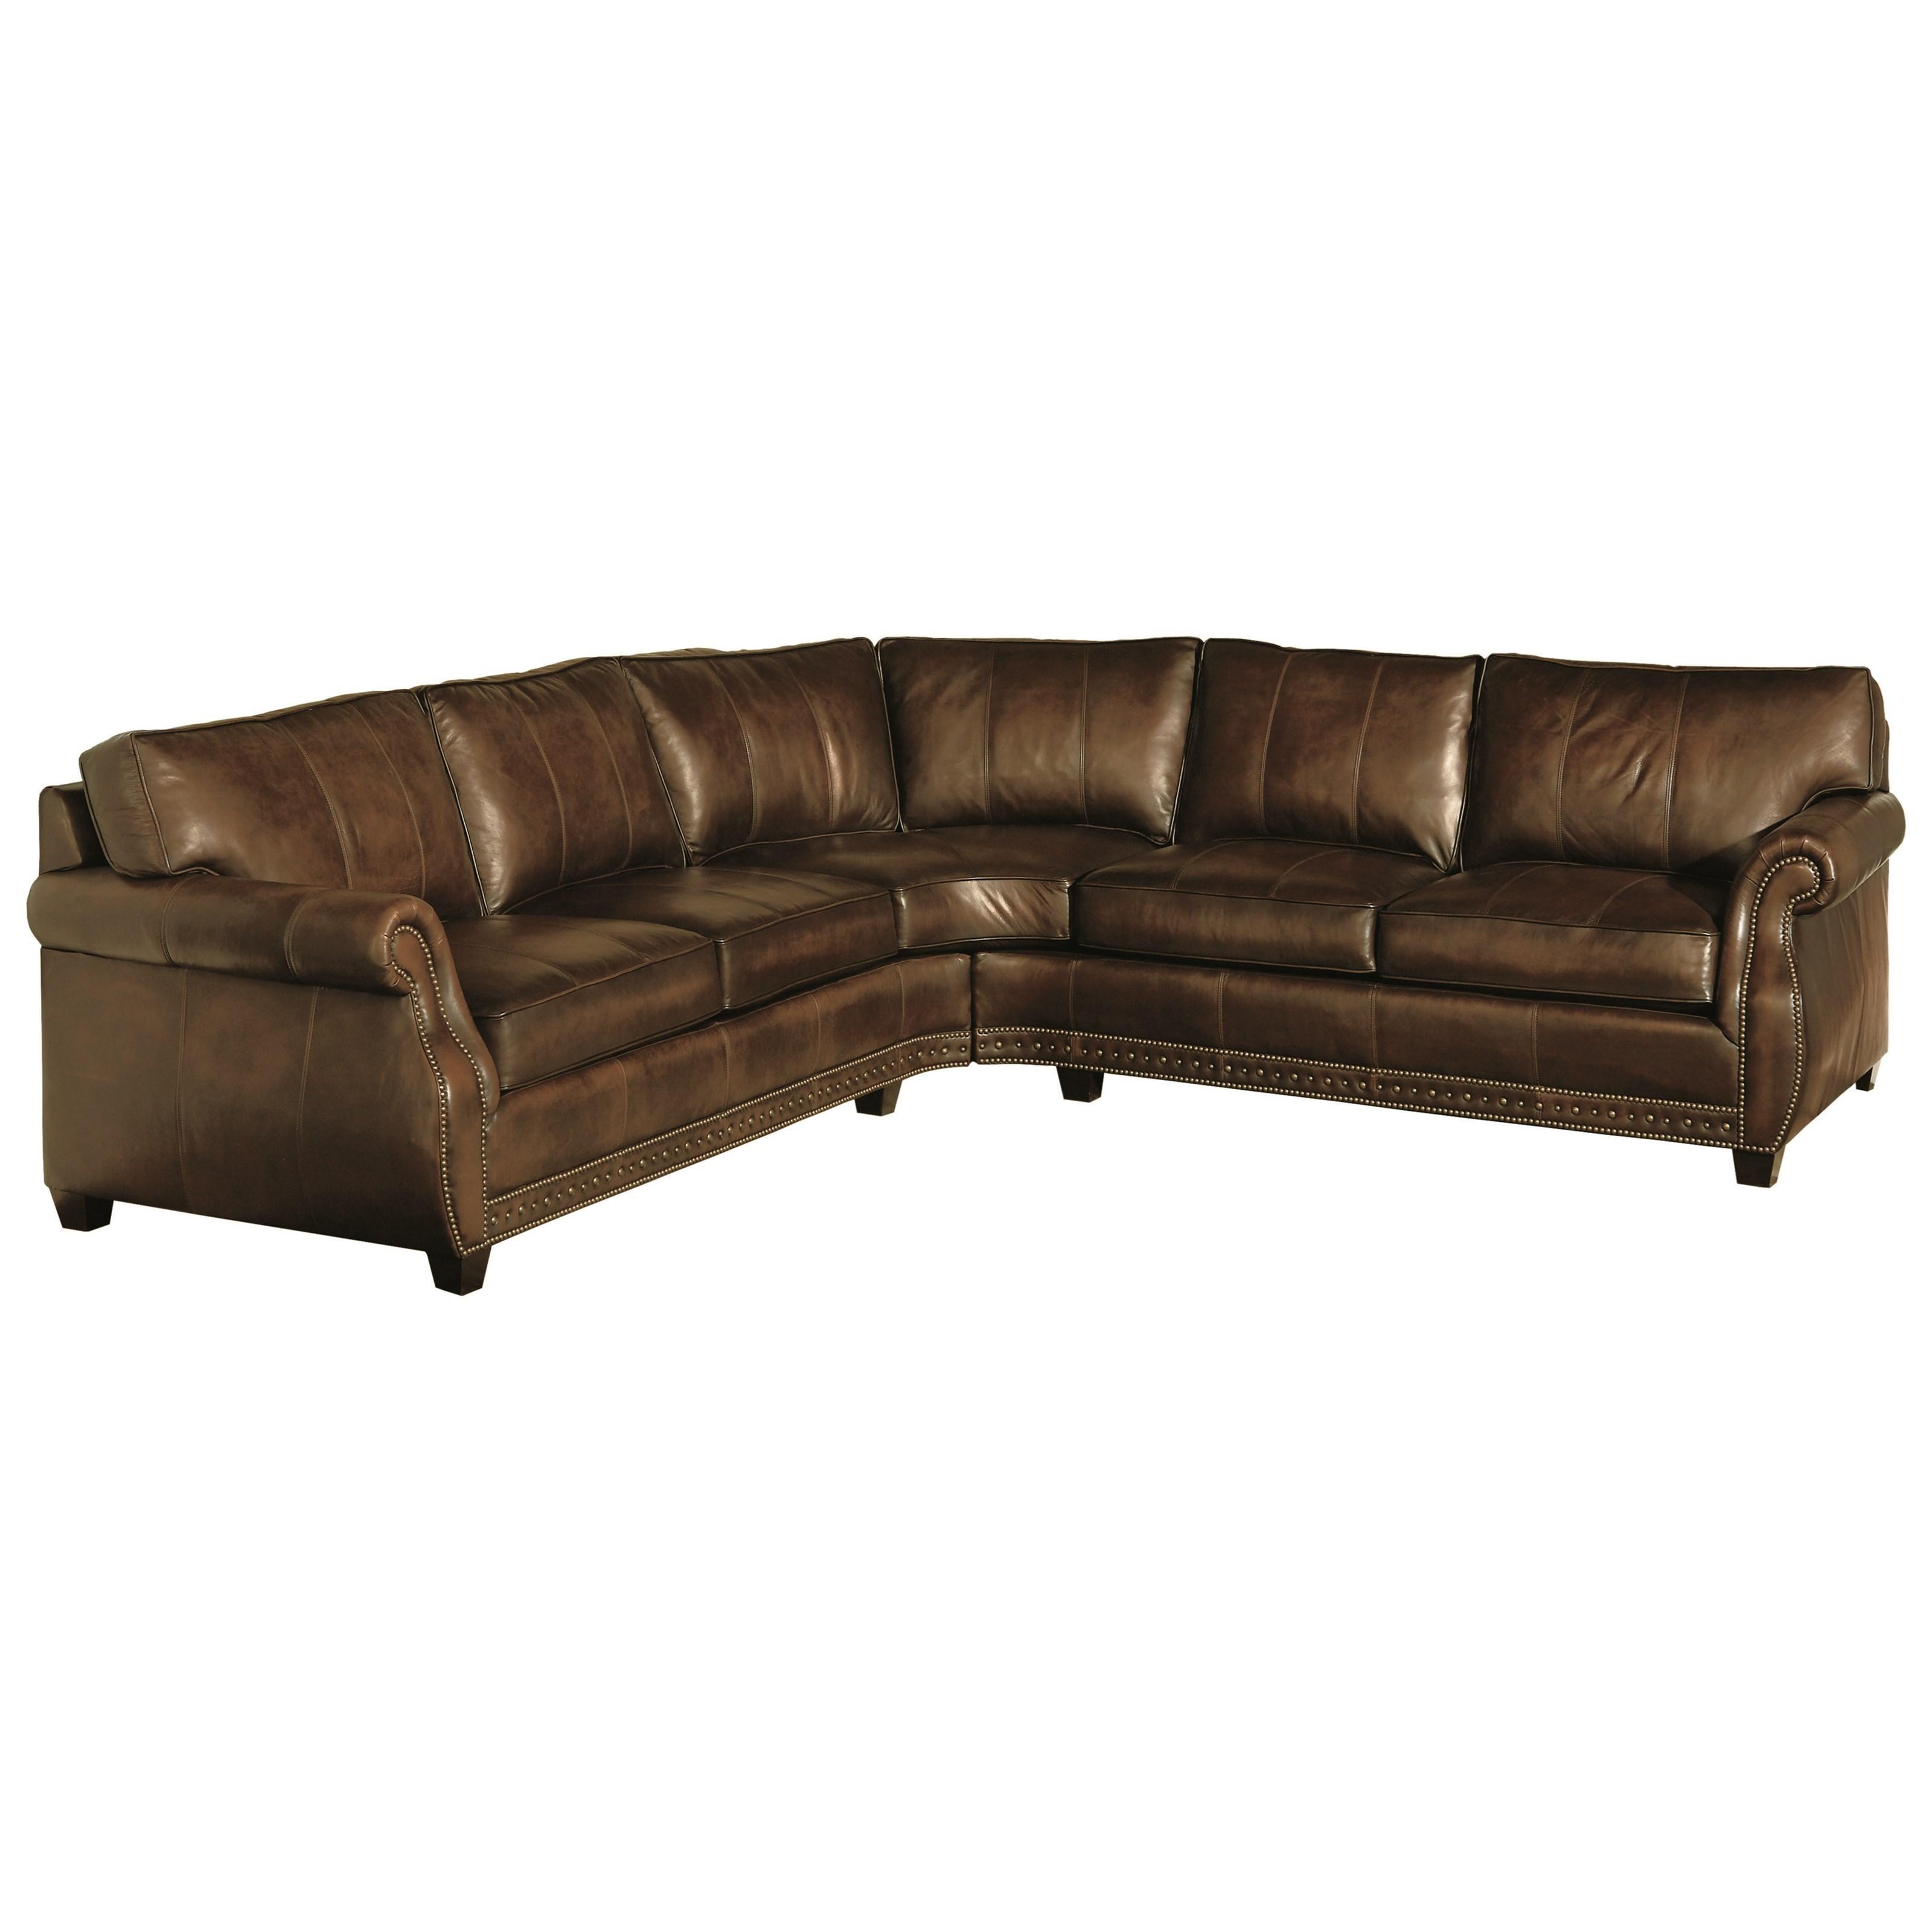 Bernhardt Bradley 1591LO 1592LO Leather Sectional Baer